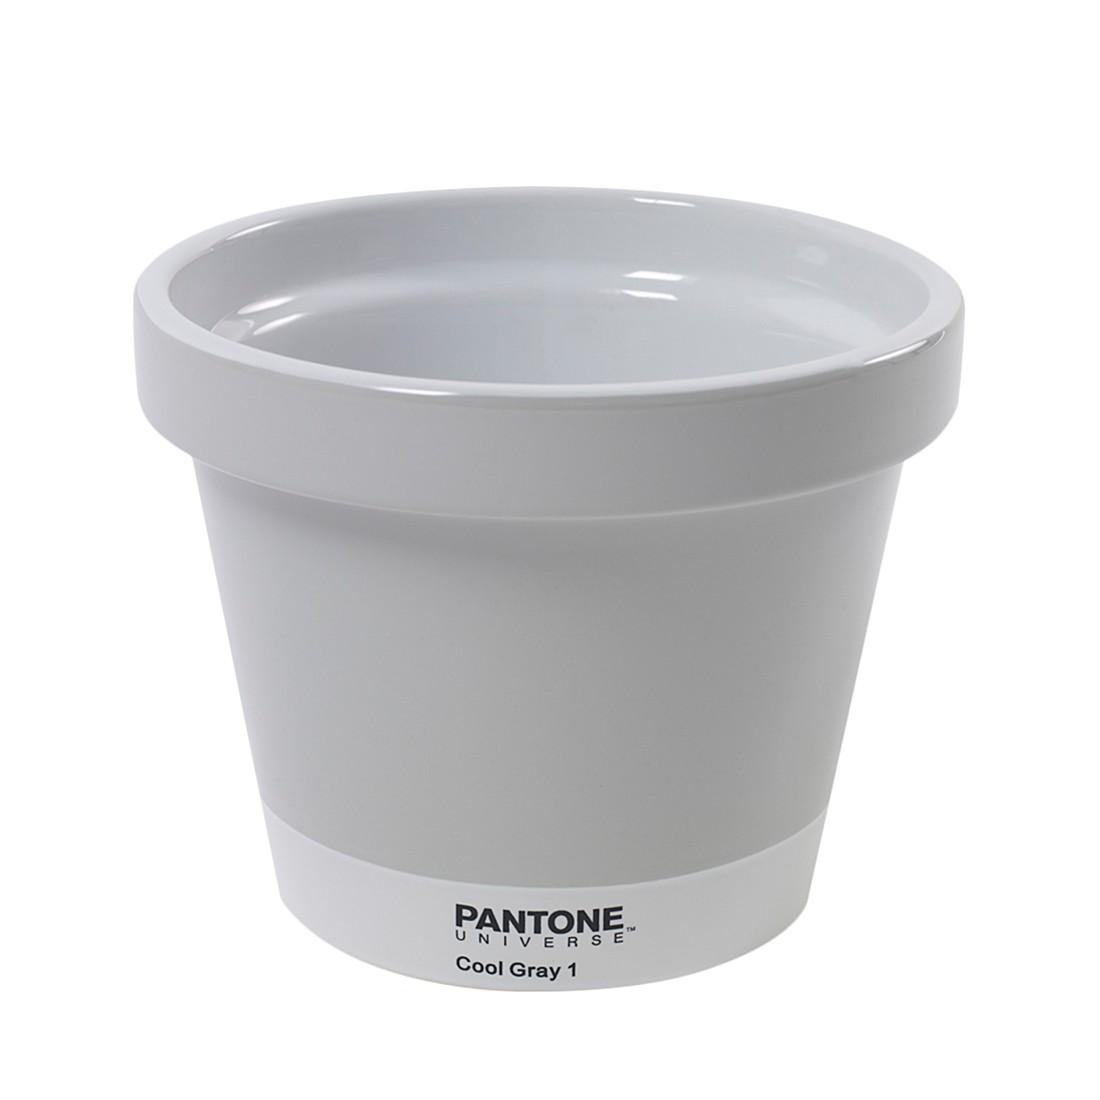 Blumentopf Pantone II – Hellgrau, Pantone online kaufen